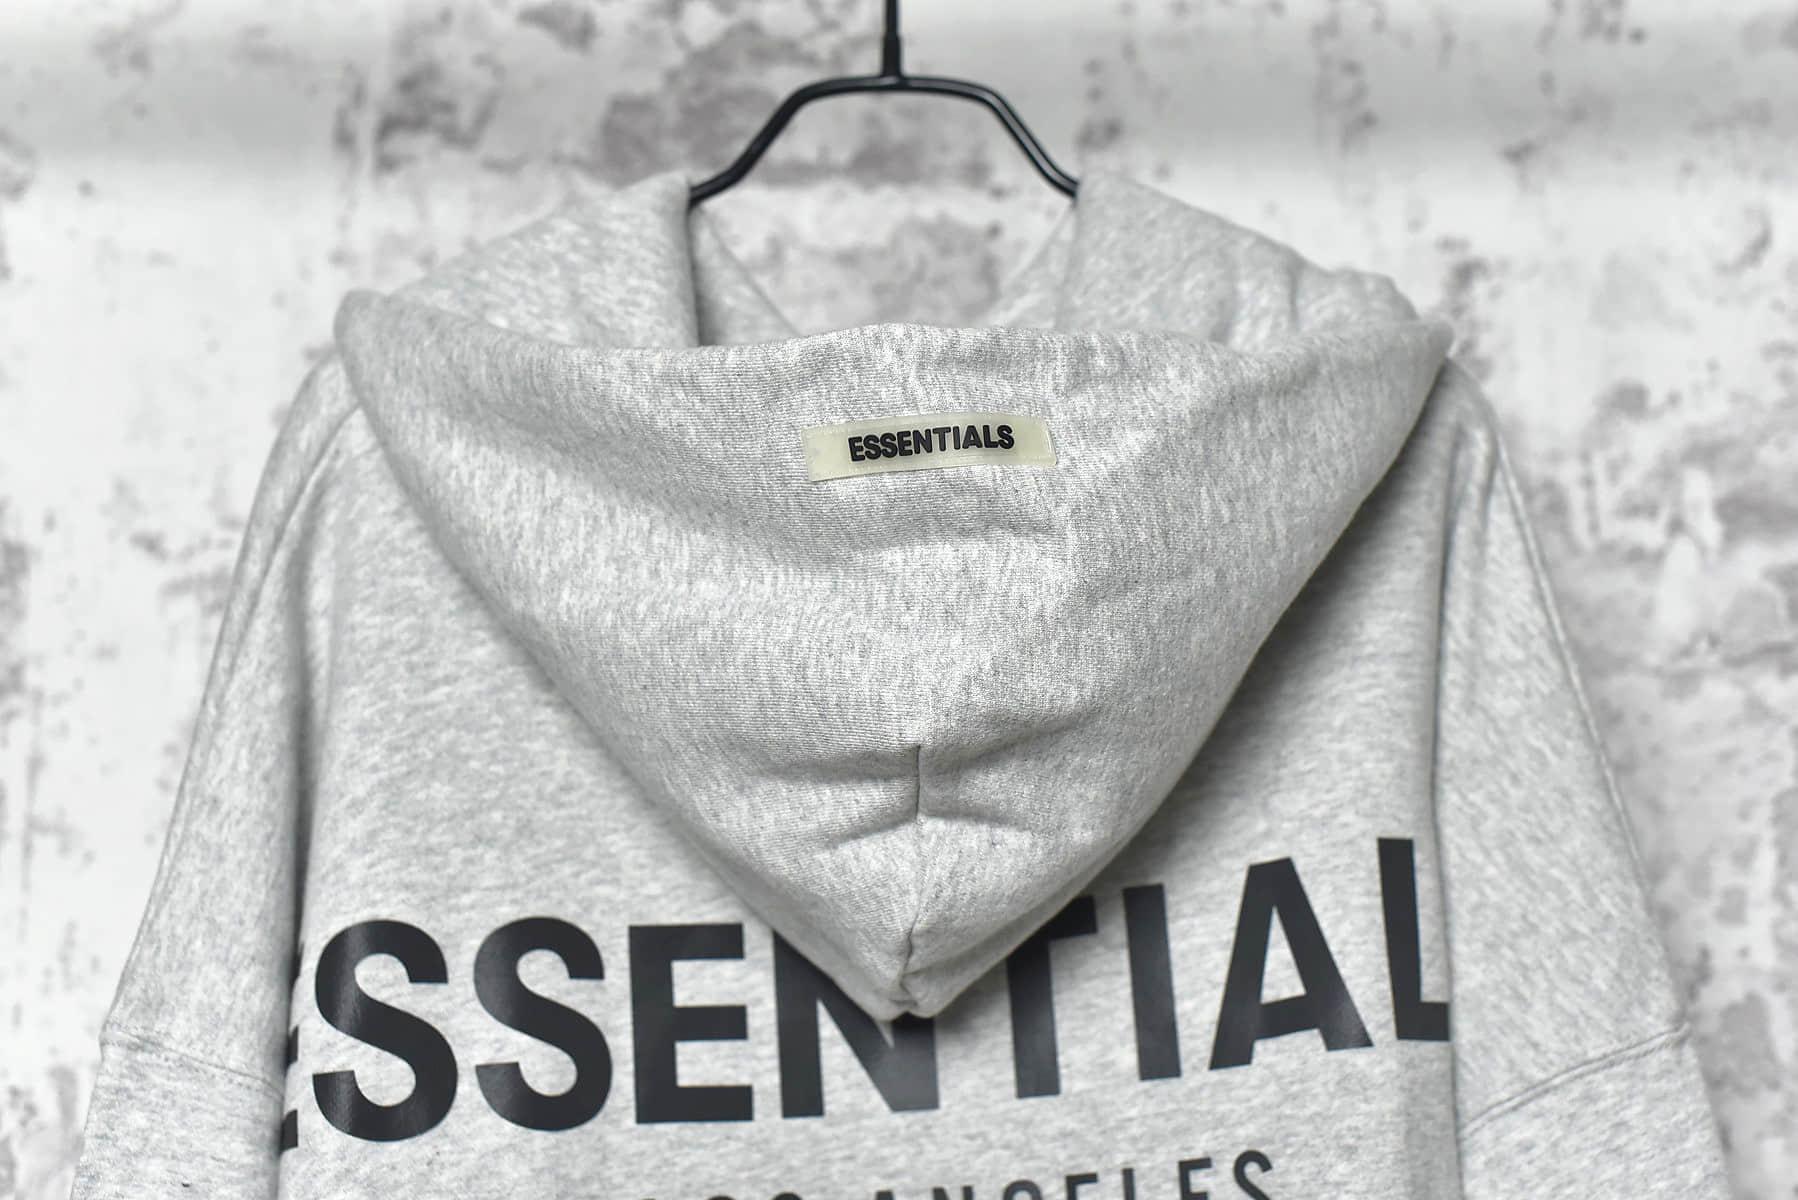 FOG洛杉矶限定灰色卫衣正品复刻 Fear Of God -Essentials 19Fw 3M反光字母印花长袖连帽卫衣-潮流者之家